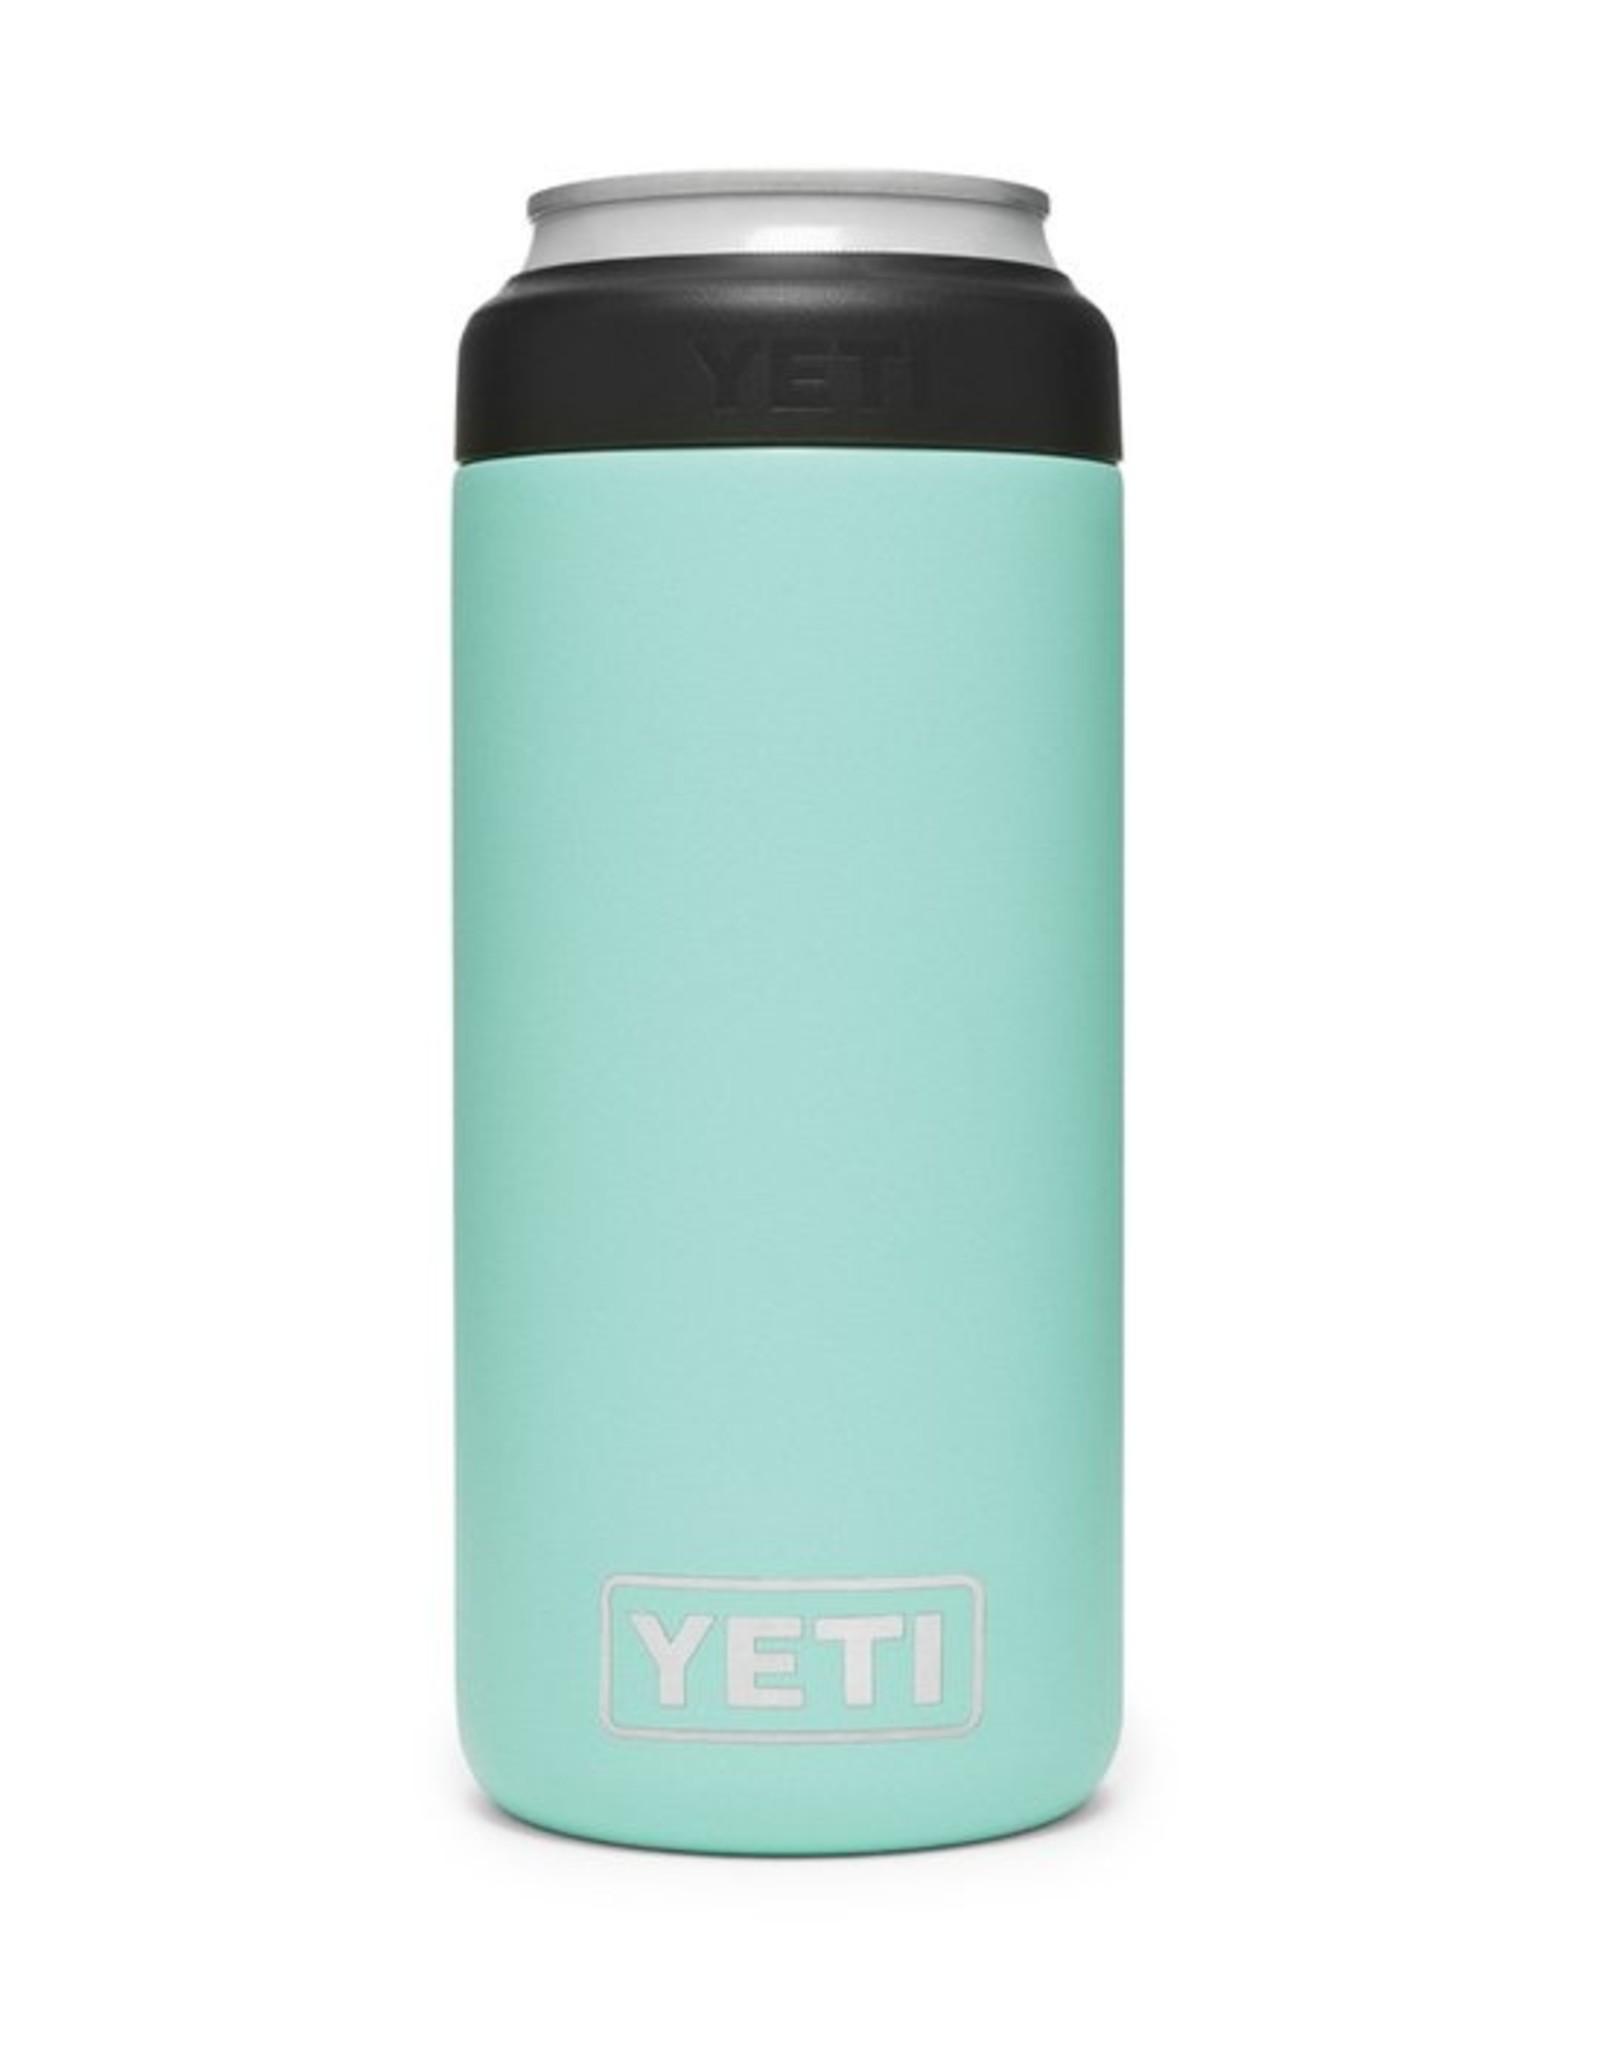 YETI Coolers Colster Slim-Seafoam